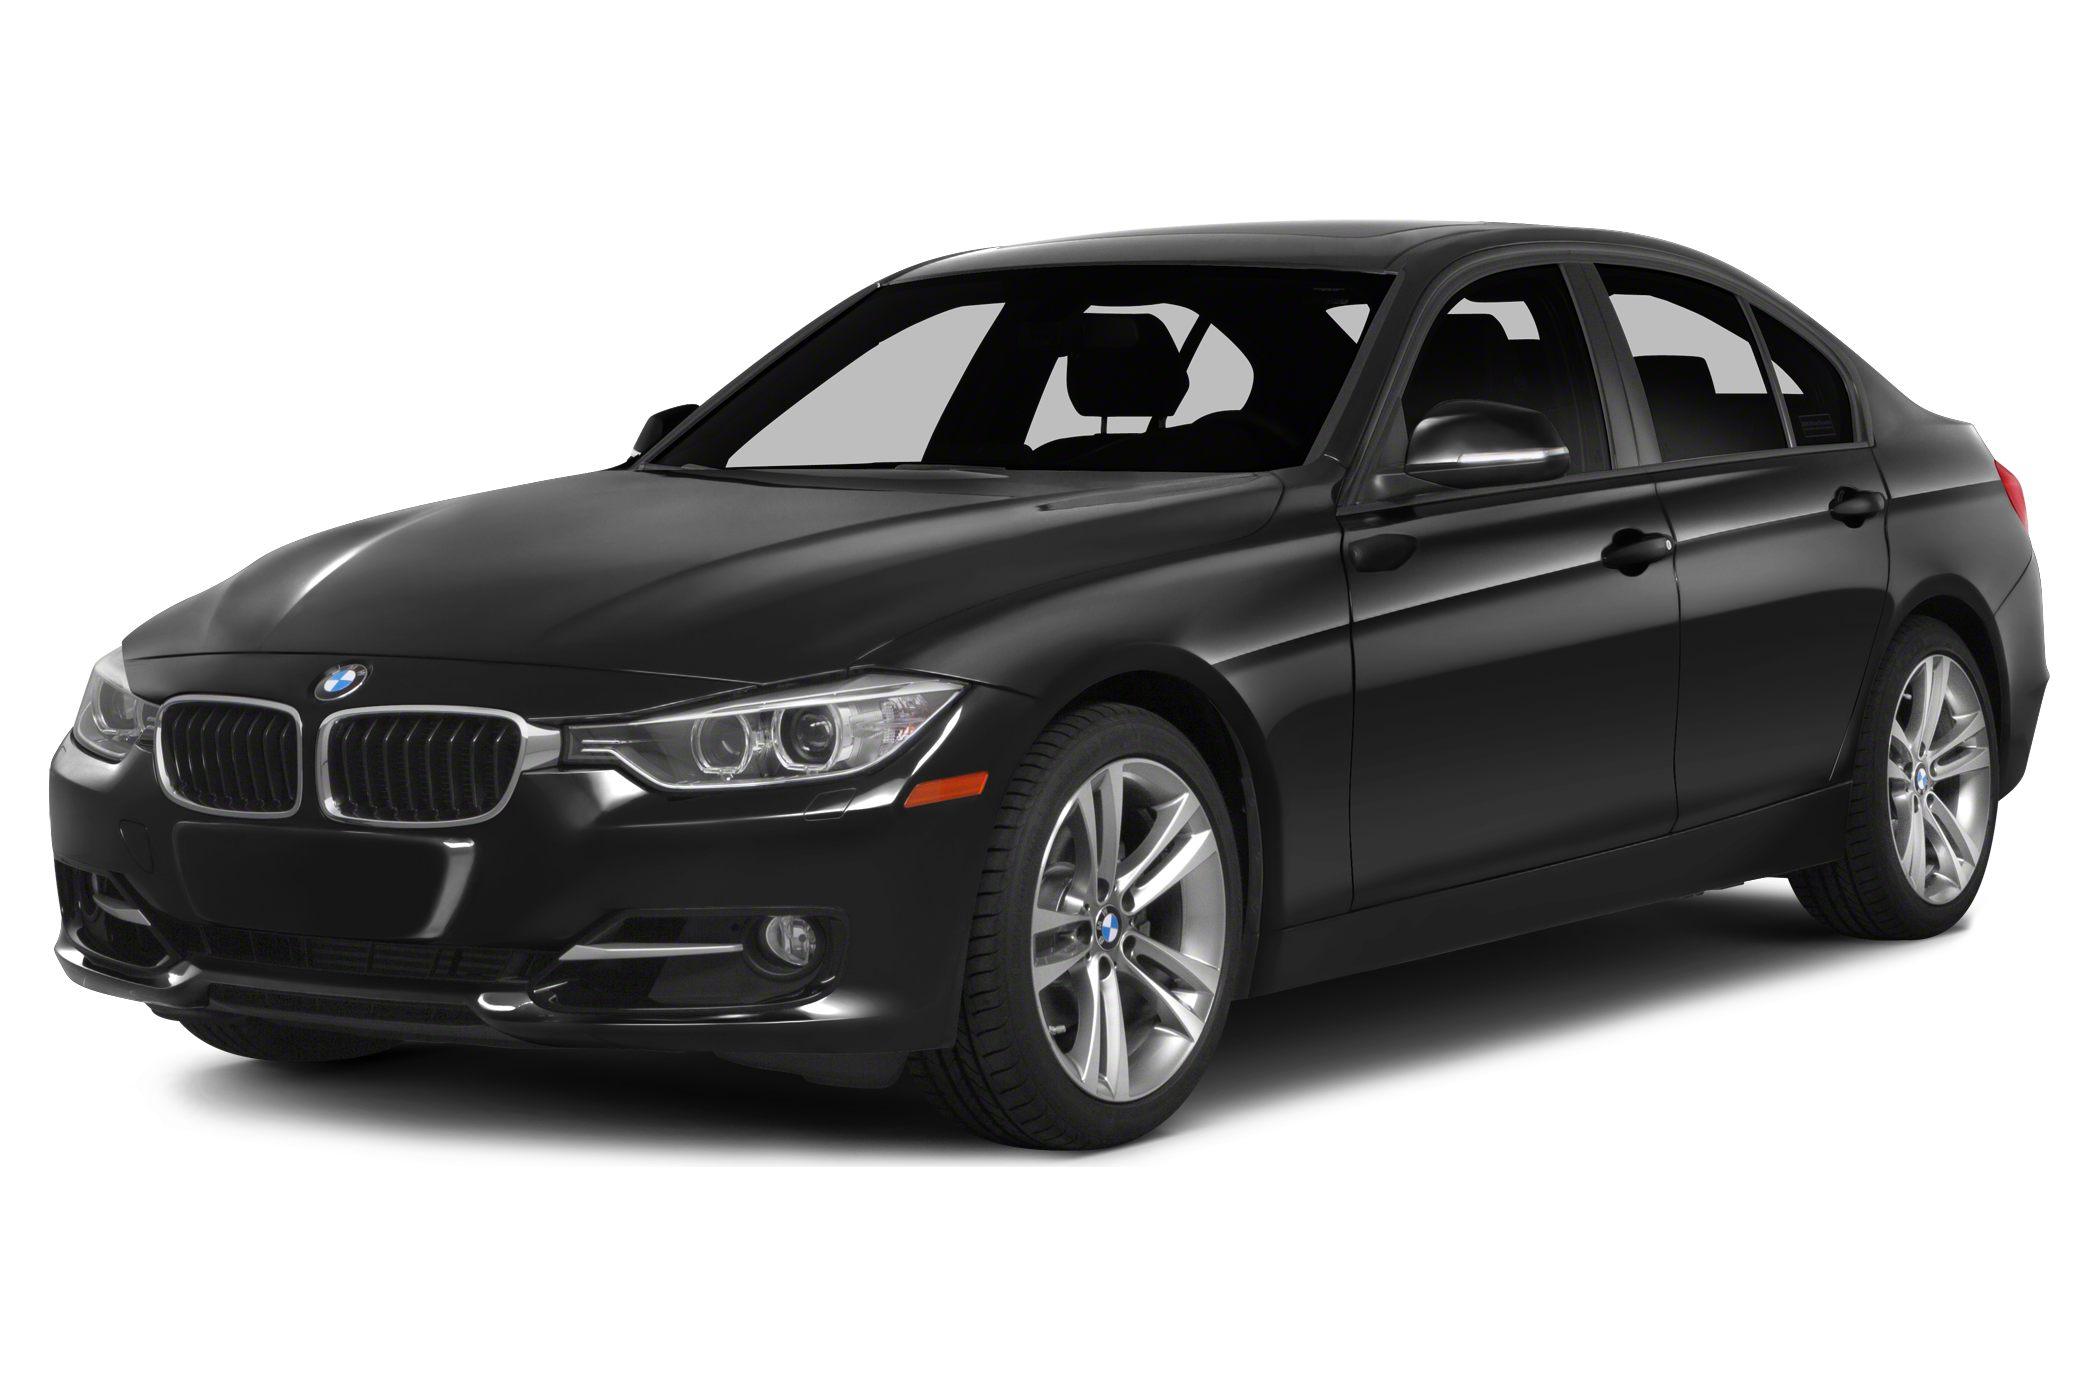 2015 BMW 328 Information